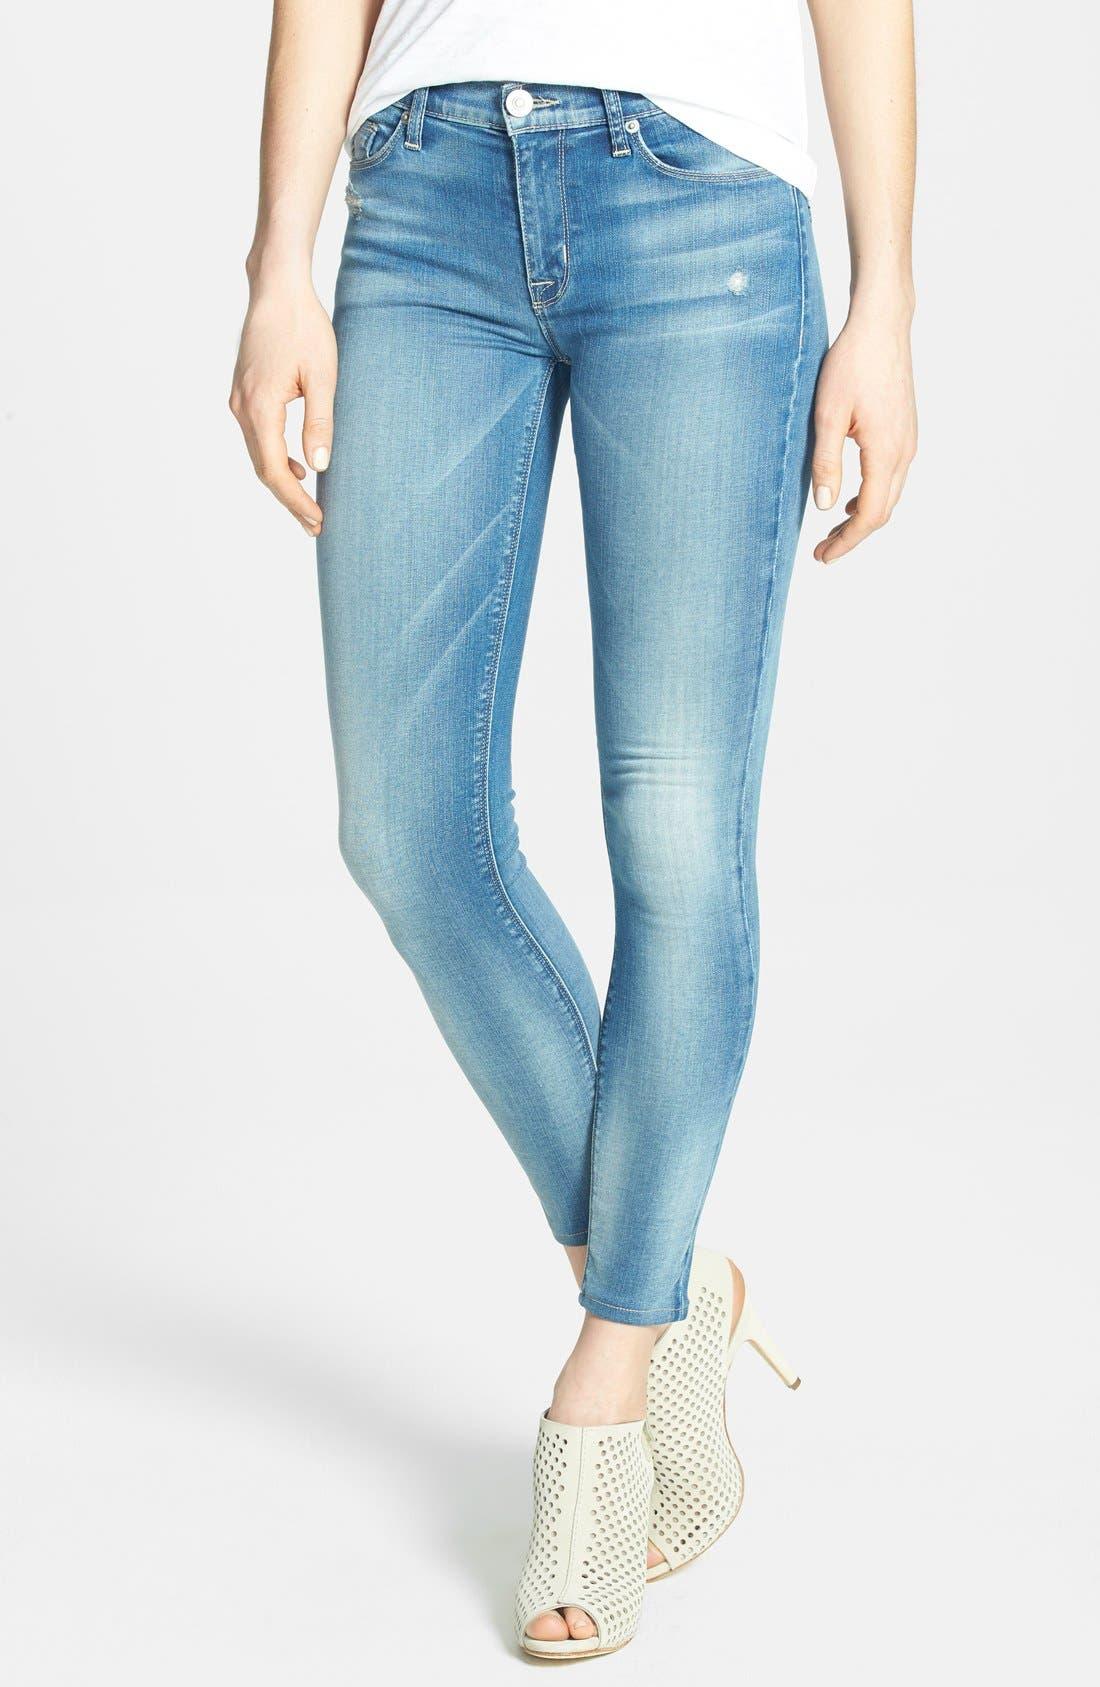 Main Image - Hudson Jeans 'Krista' Crop Skinny Jeans (Voodoo Child)